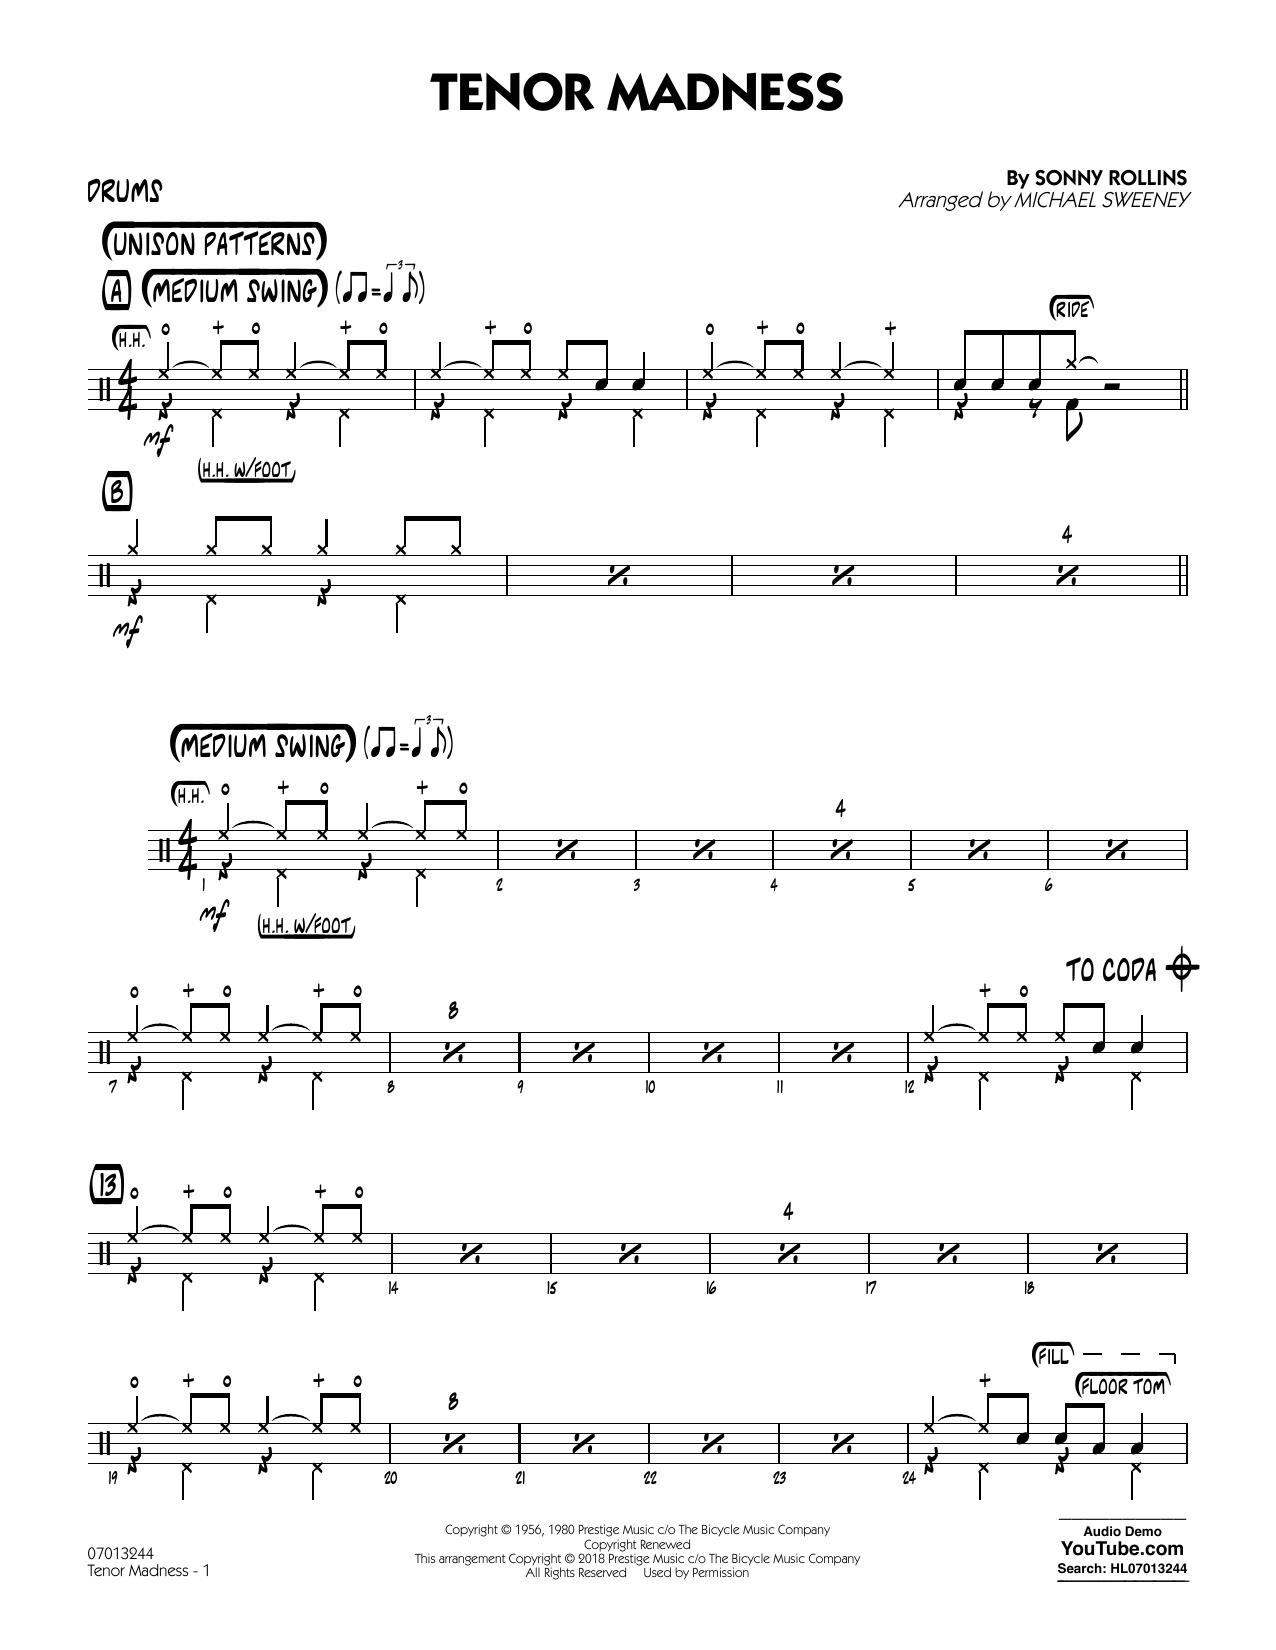 Tenor Madness (arr  Michael Sweeney) - Drums by Sonny Rollins Jazz Ensemble  Digital Sheet Music